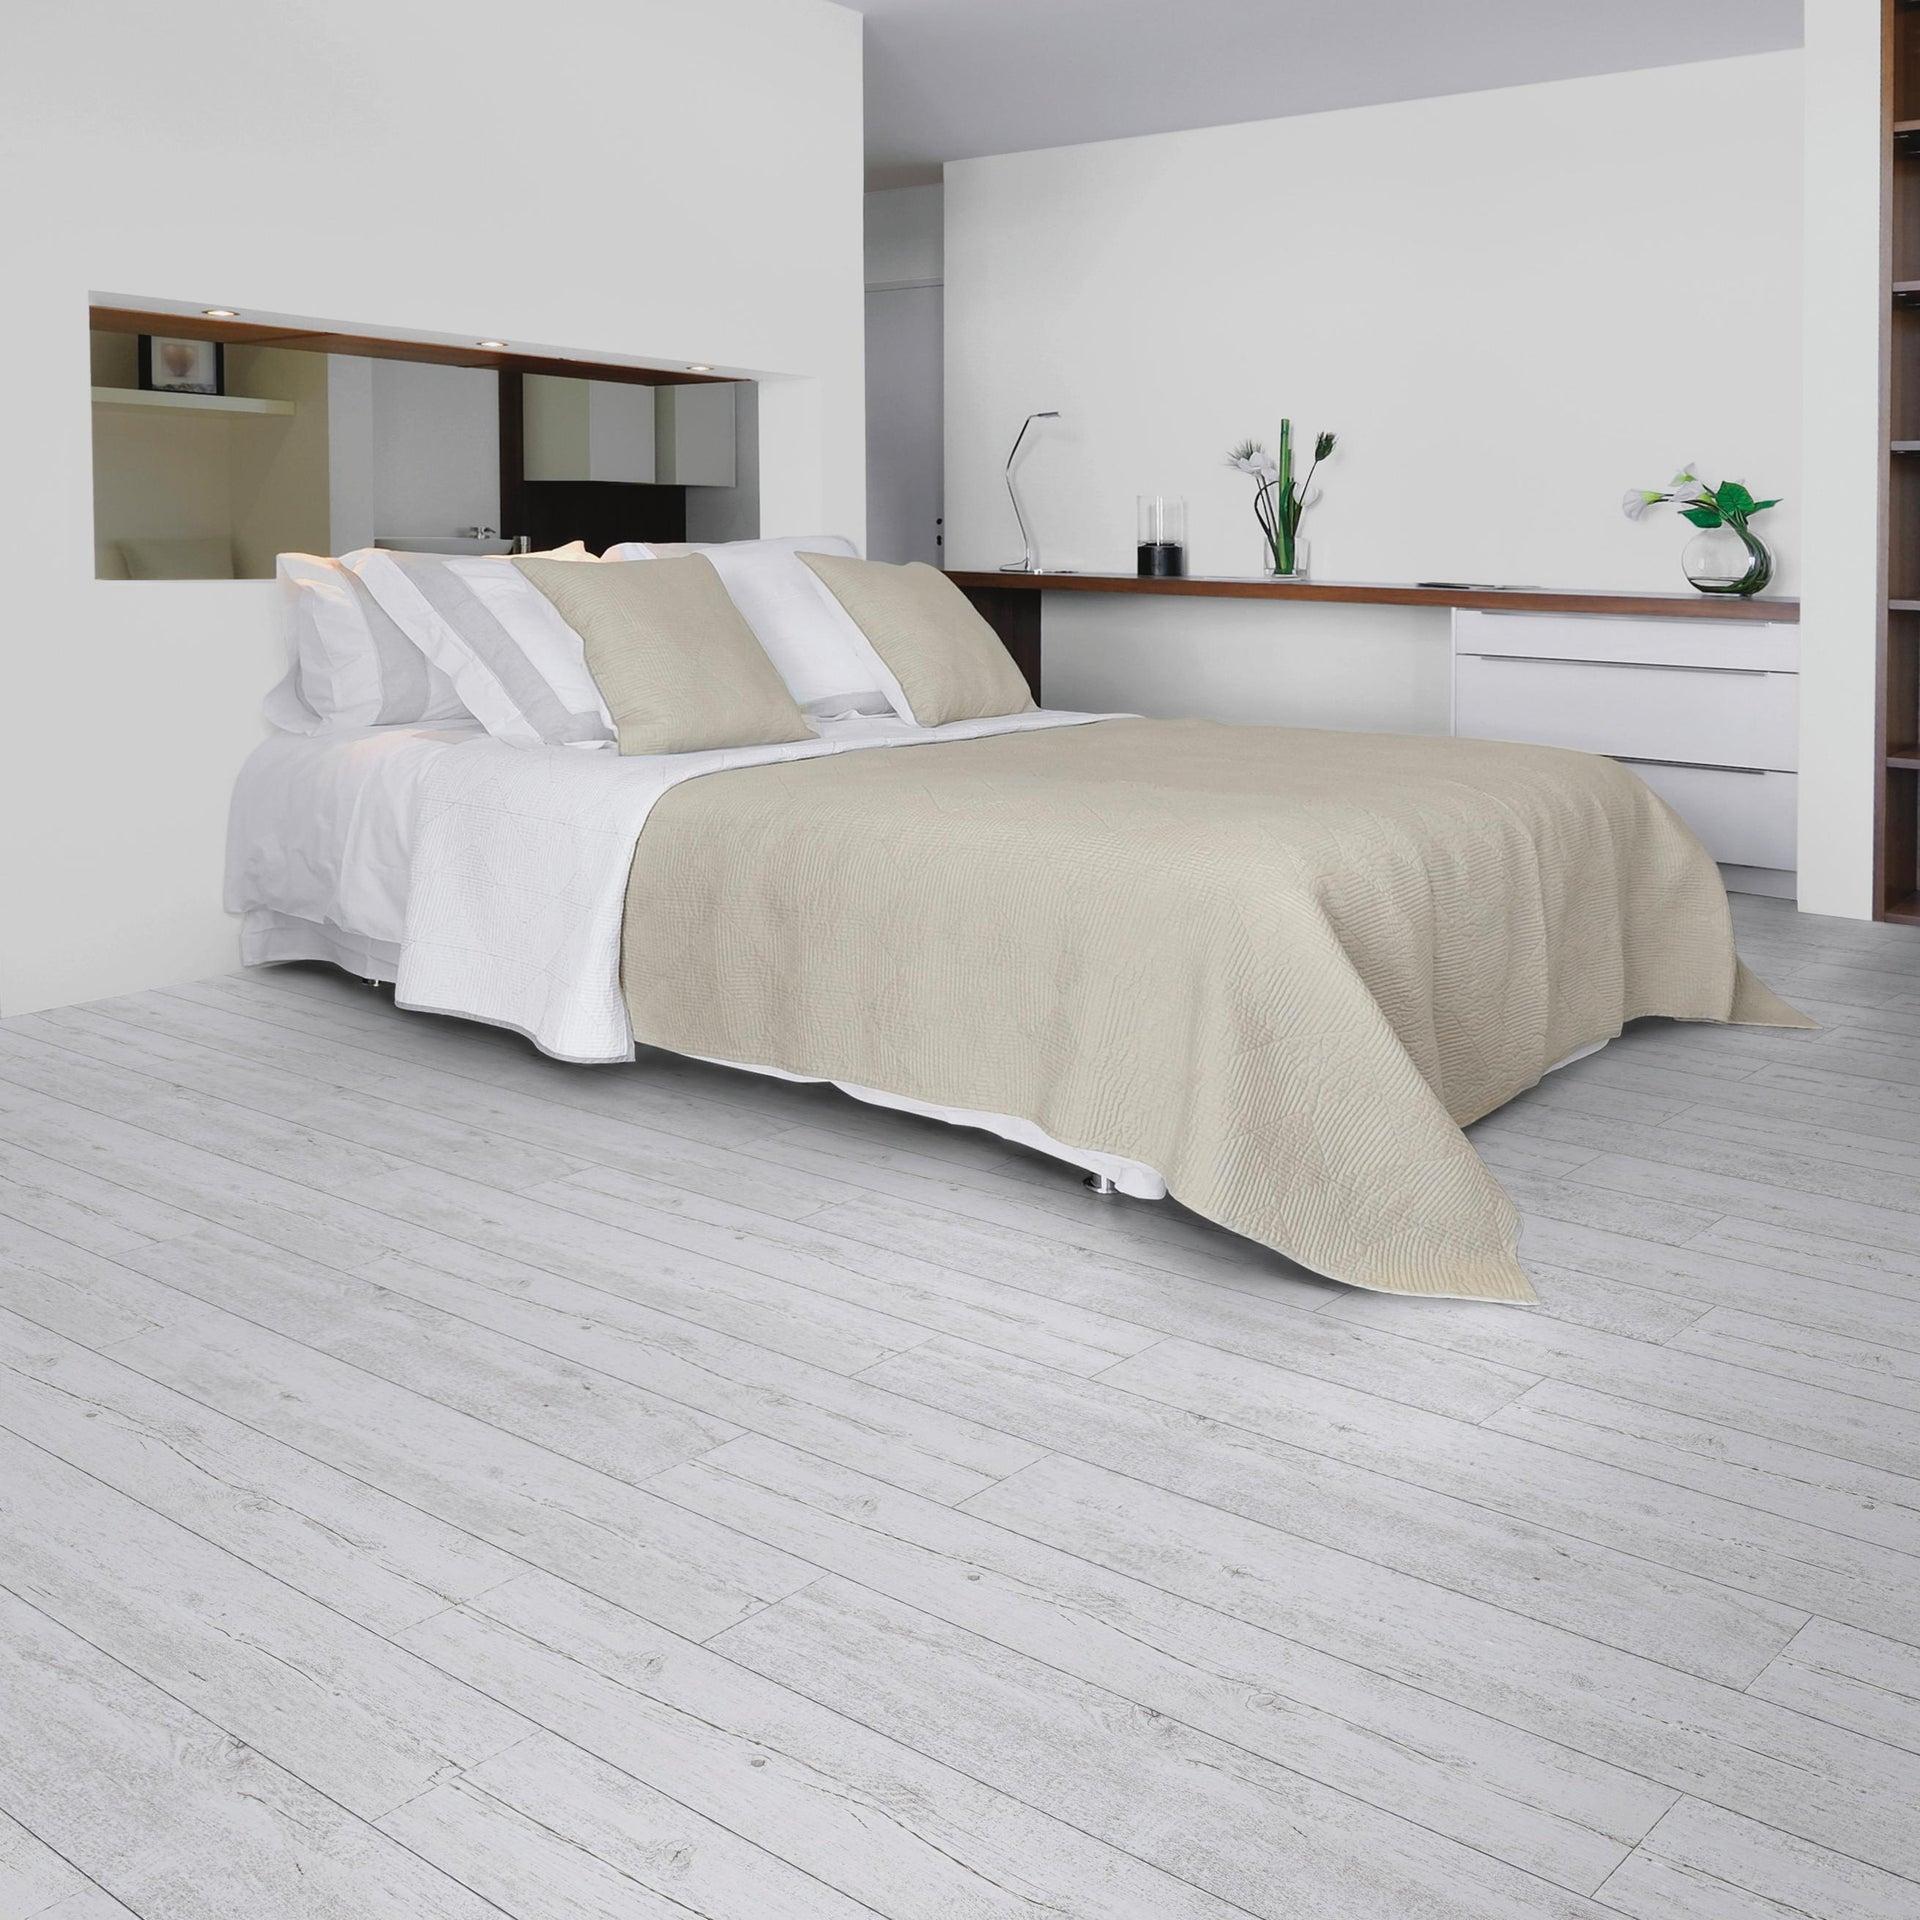 Pavimento PVC adesivo White Pecan Sp 2 mm bianco - 1